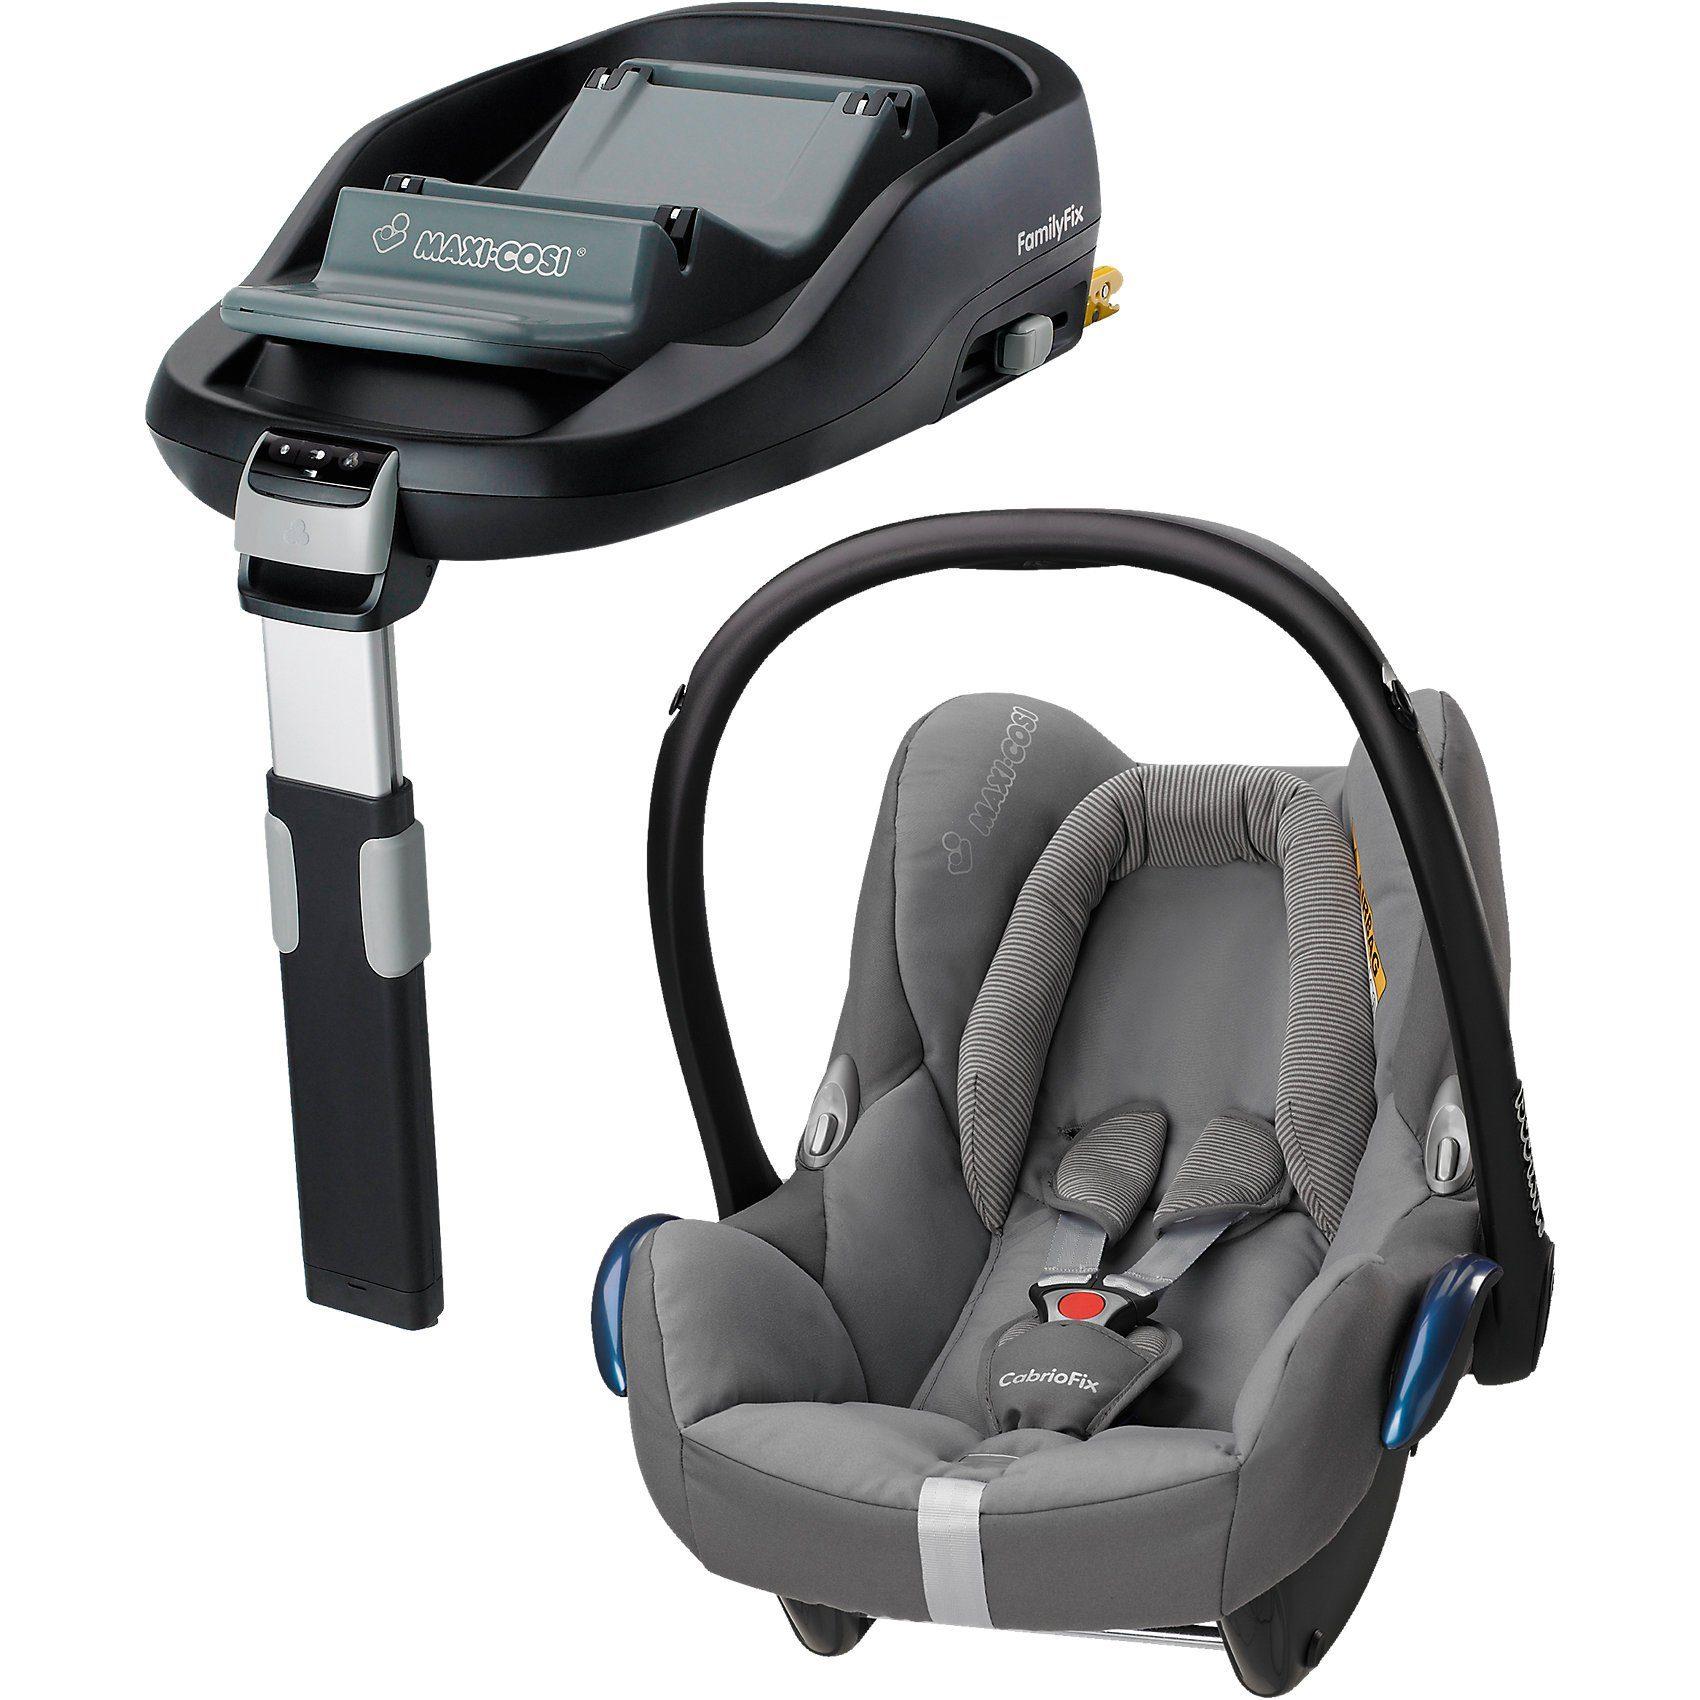 Maxi-Cosi Babyschale Cabriofix, concrete grey, inkl. FamilyFix